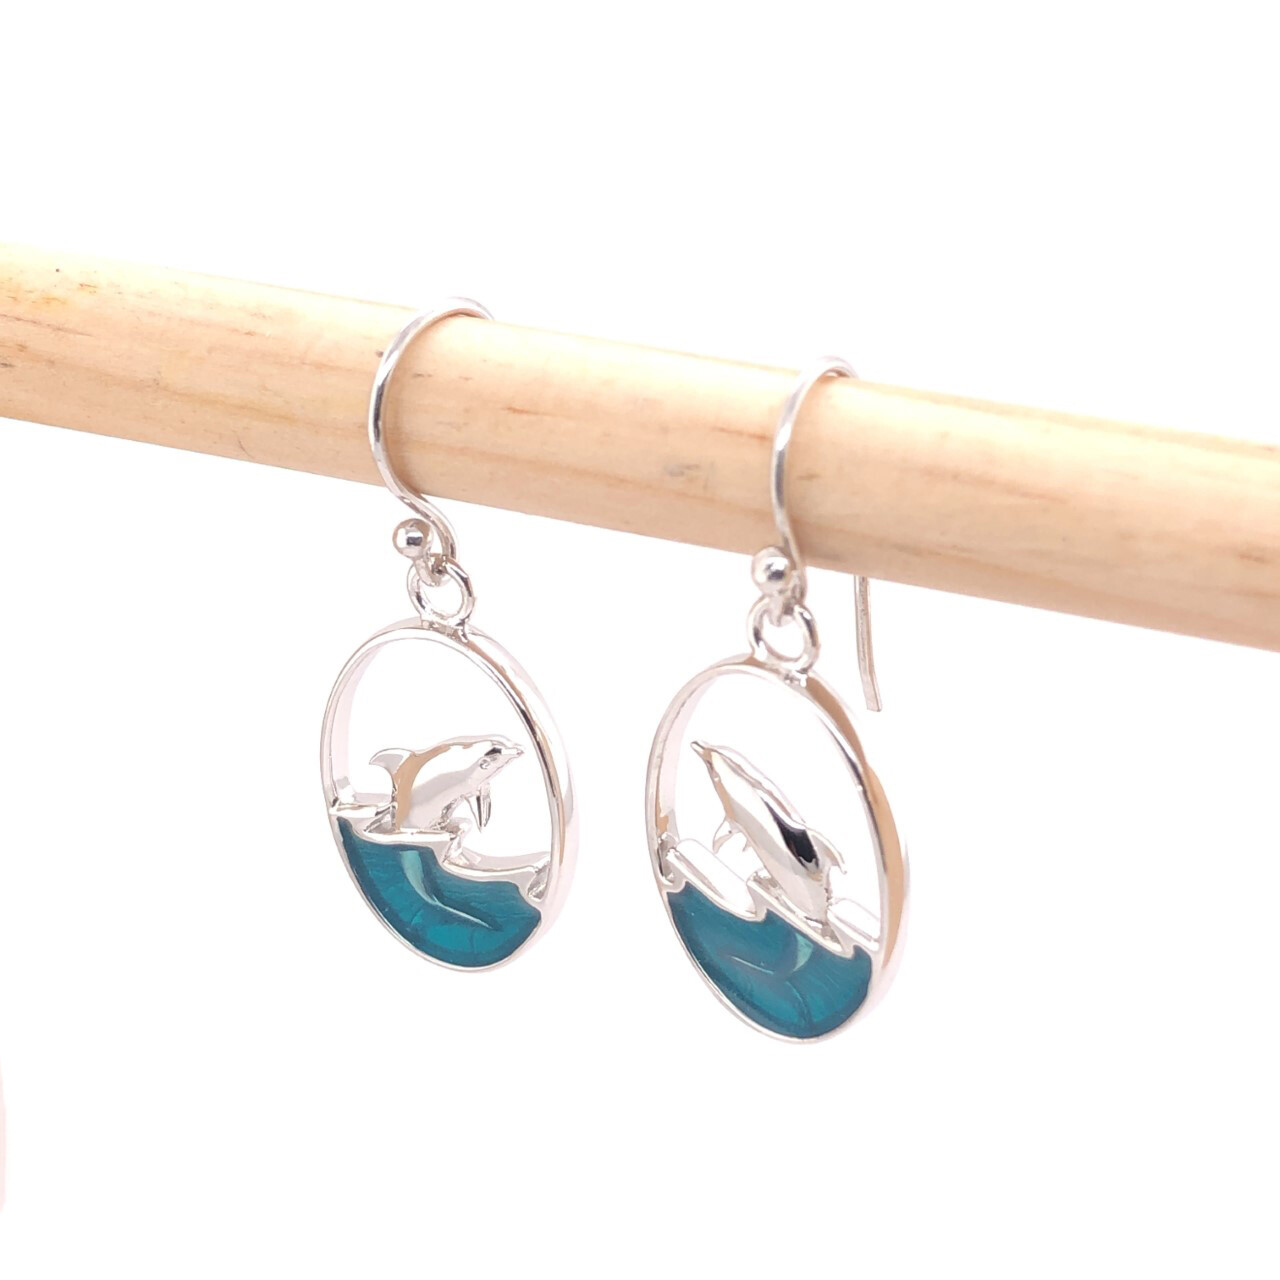 004 Leaping Dolphin Earrings